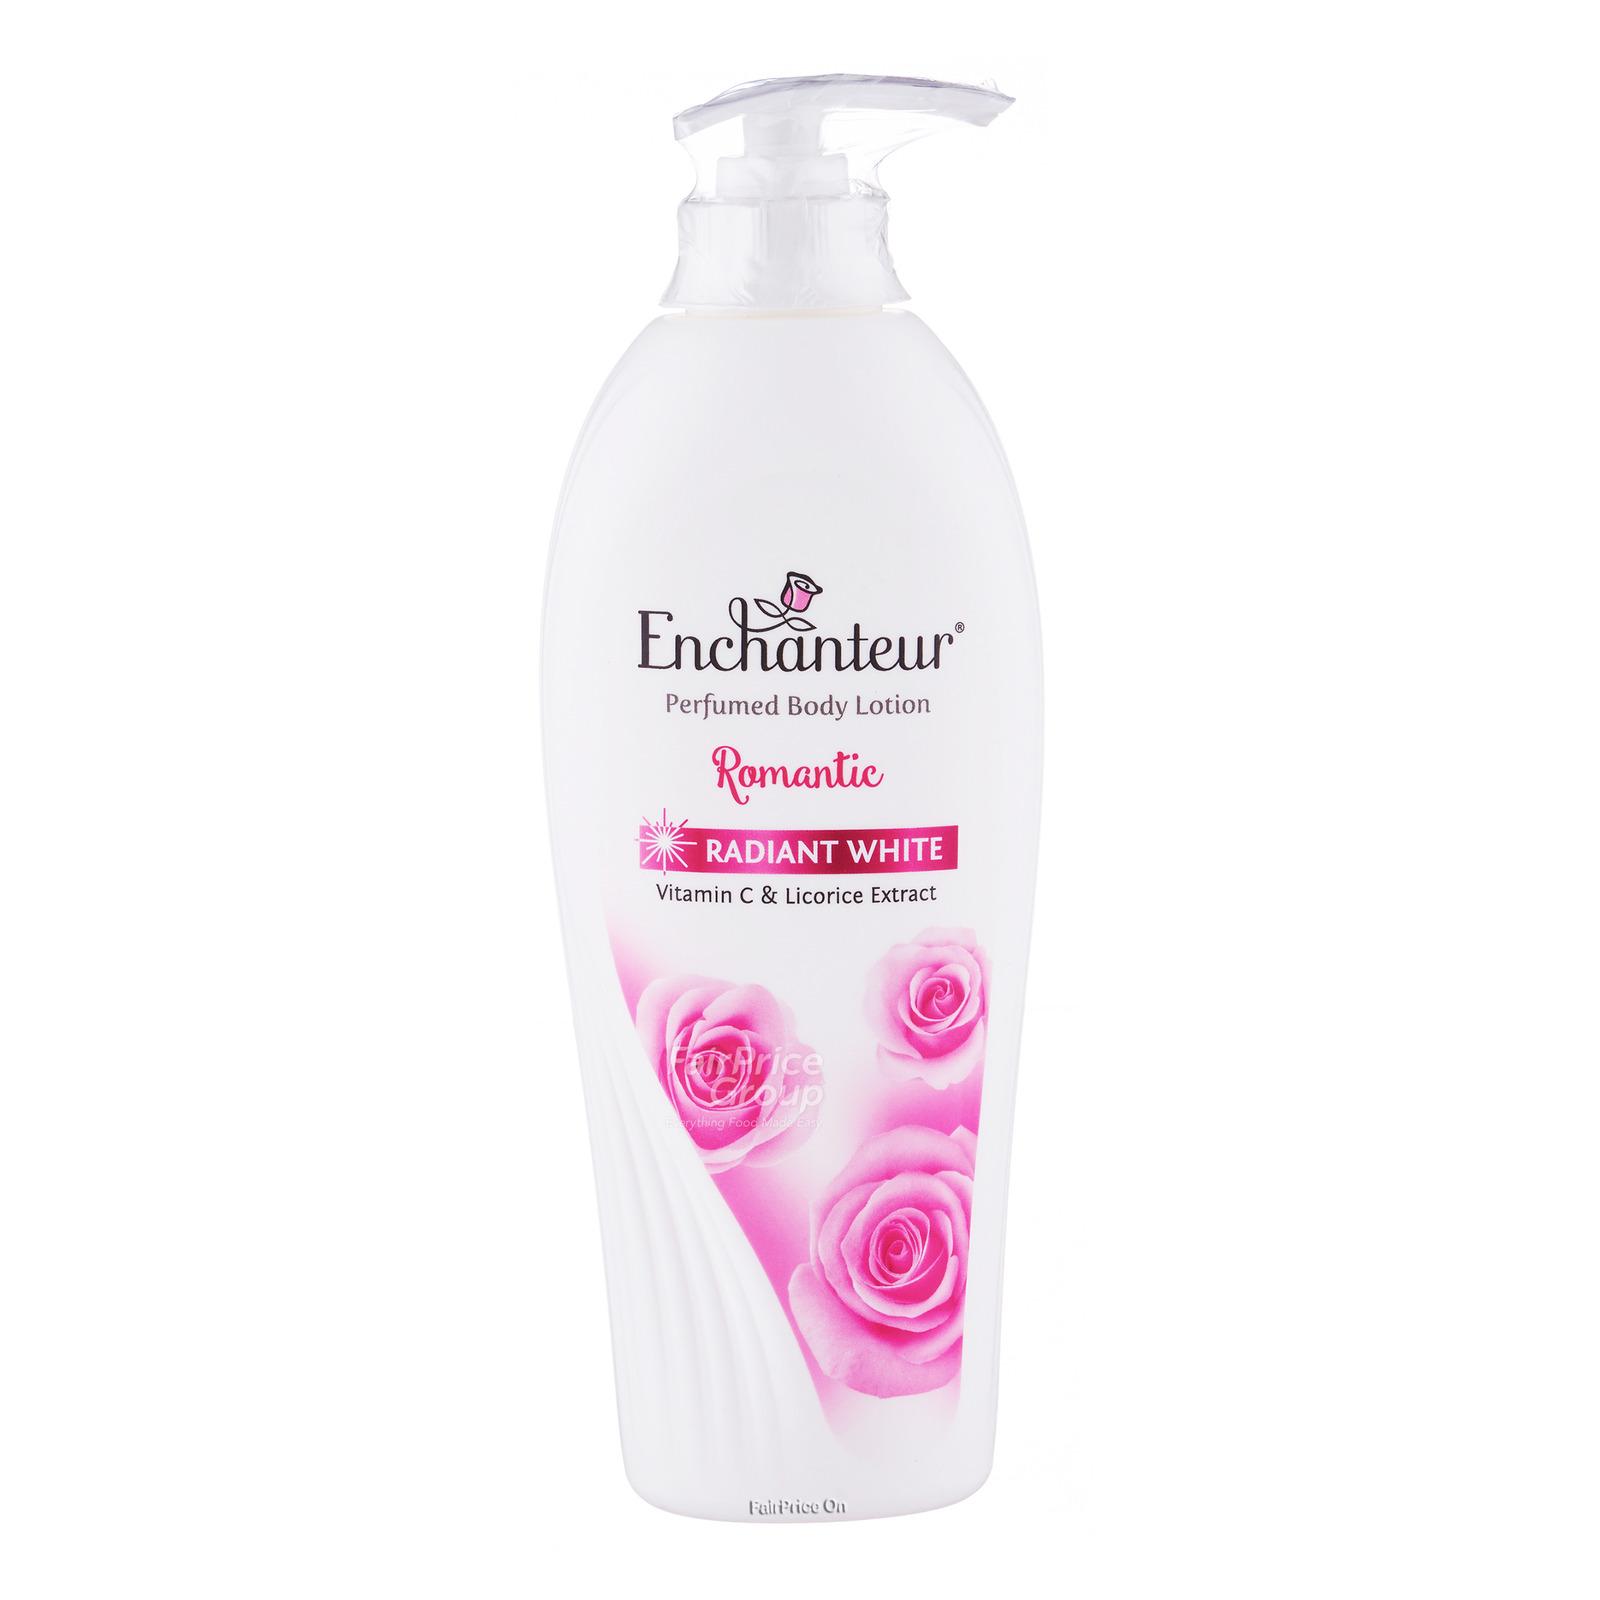 Enchanteur Whitening Perfumed Body Lotion - Romantic